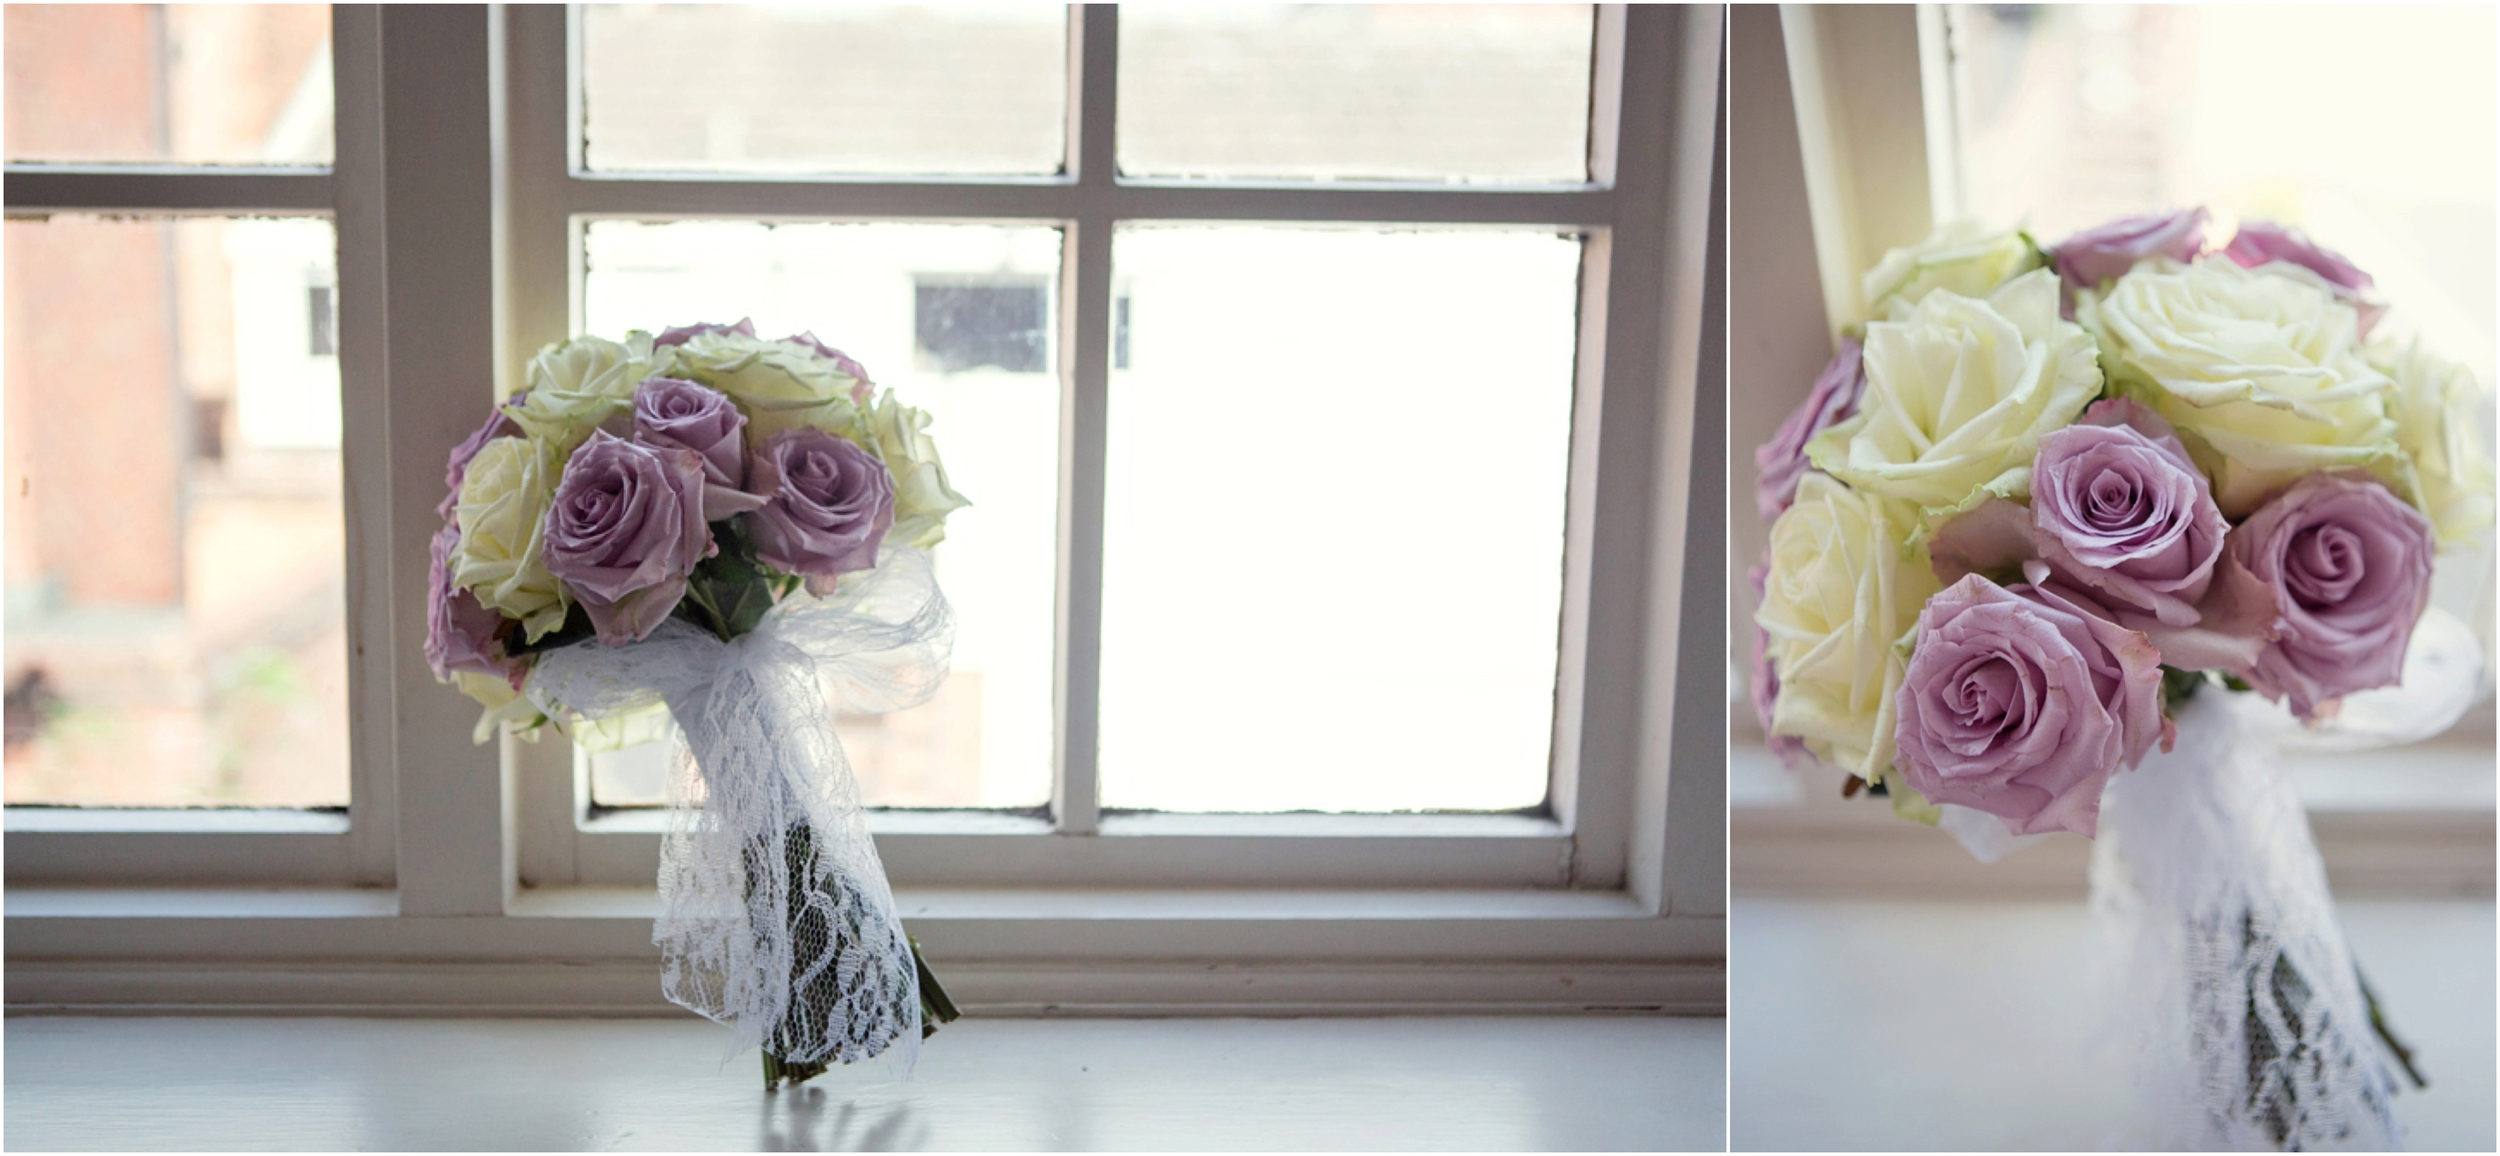 Sophie Evans Photography, Warwickshire Wedding Photography, Welcombe Hotel  (9).jpg